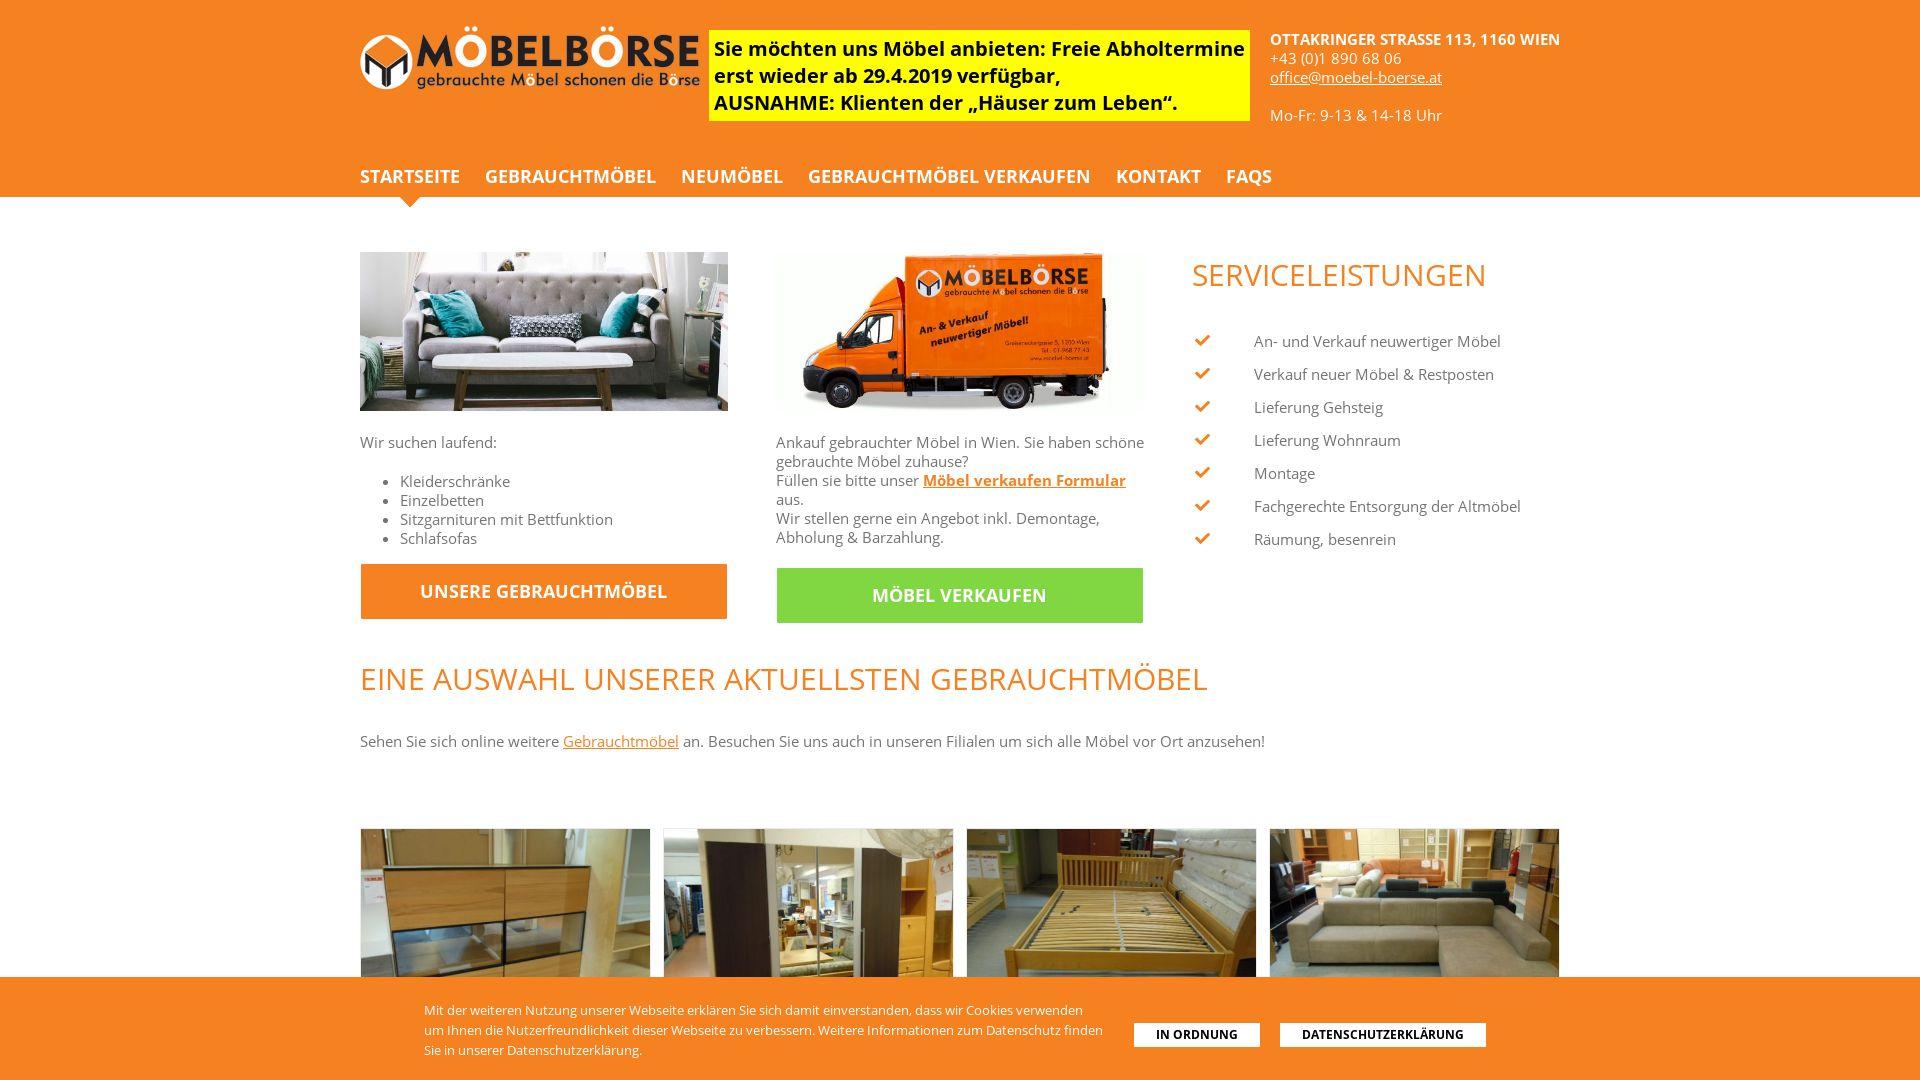 Möbelbörse Dölzl Schwendtbauer Og Wien Firmenwebseitenat